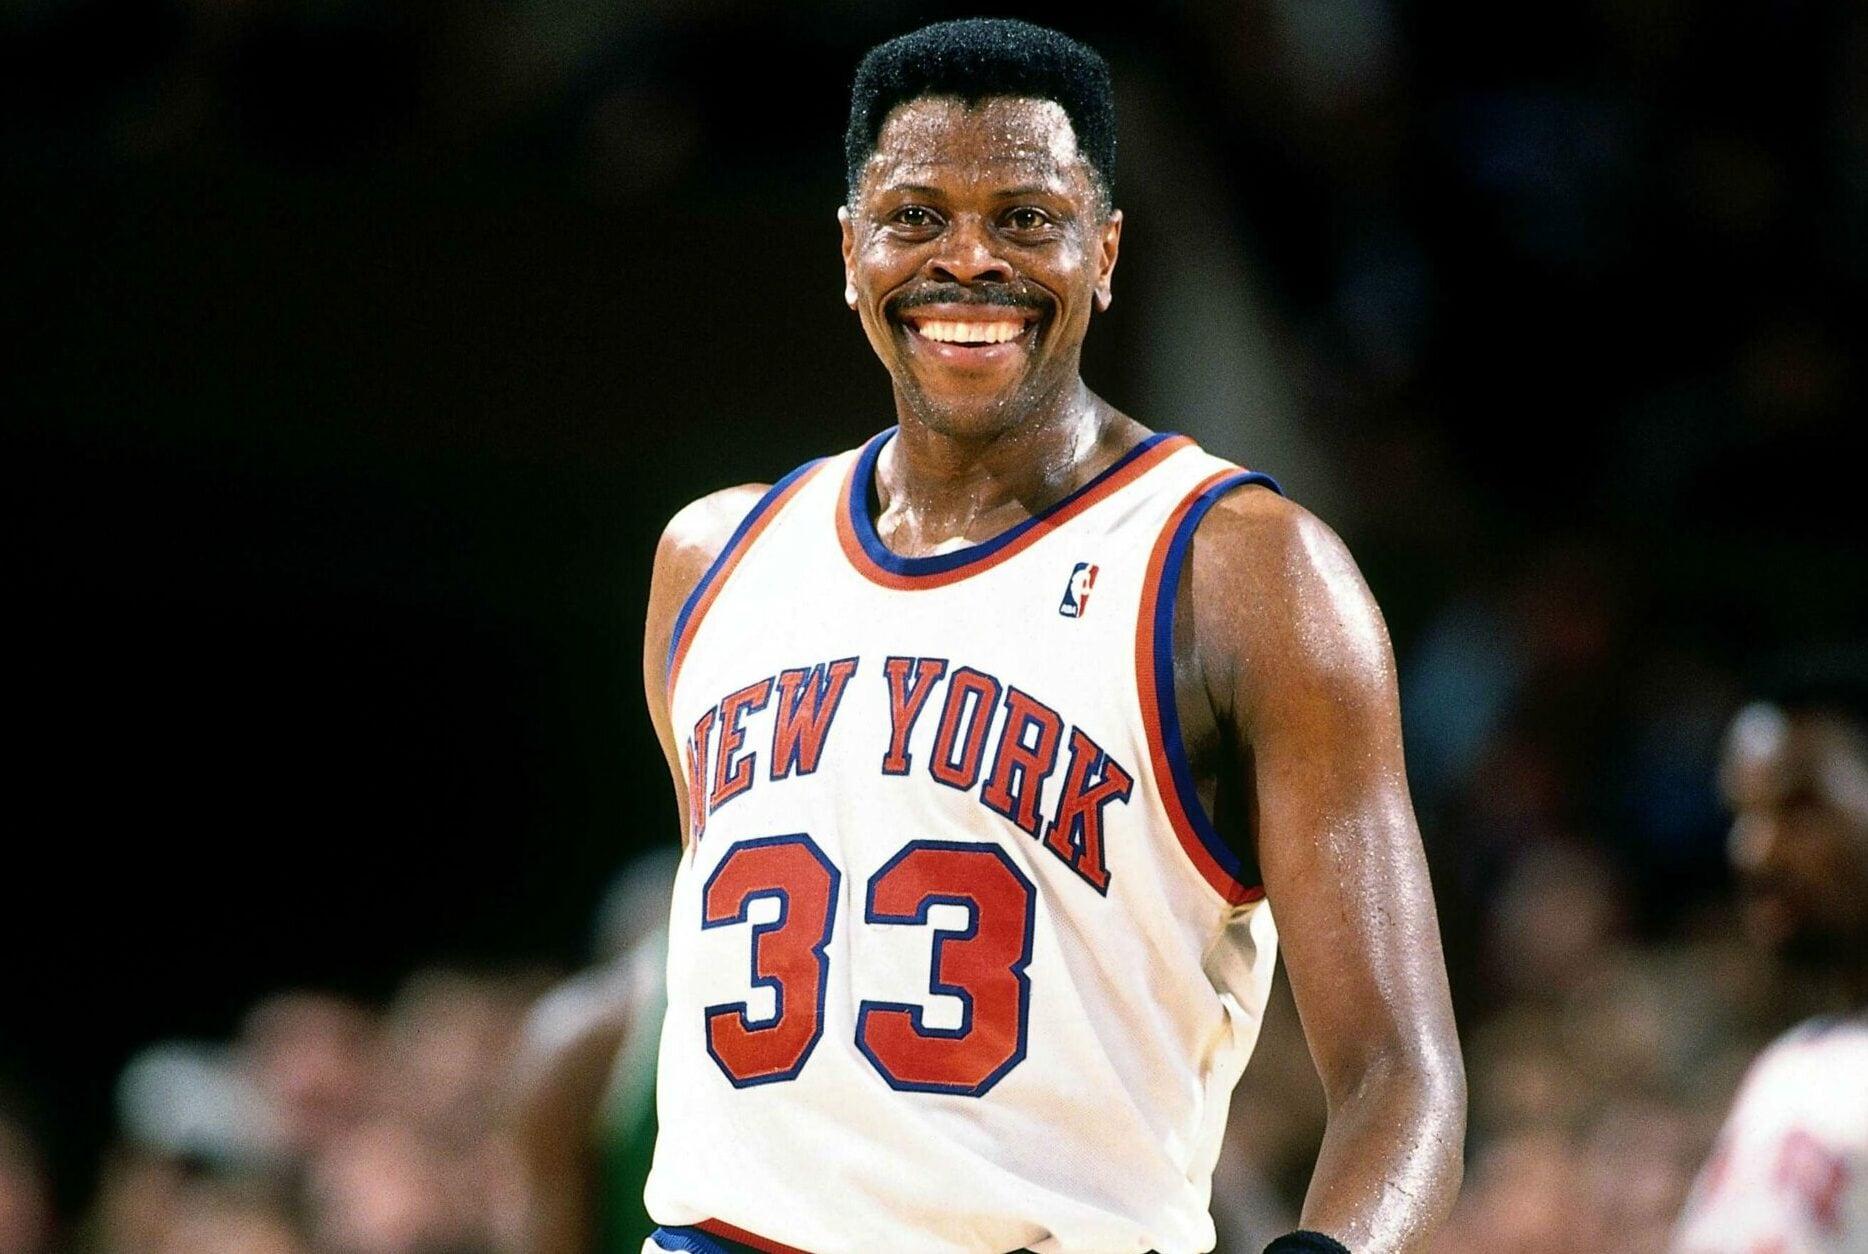 Legends profile: Patrick Ewing